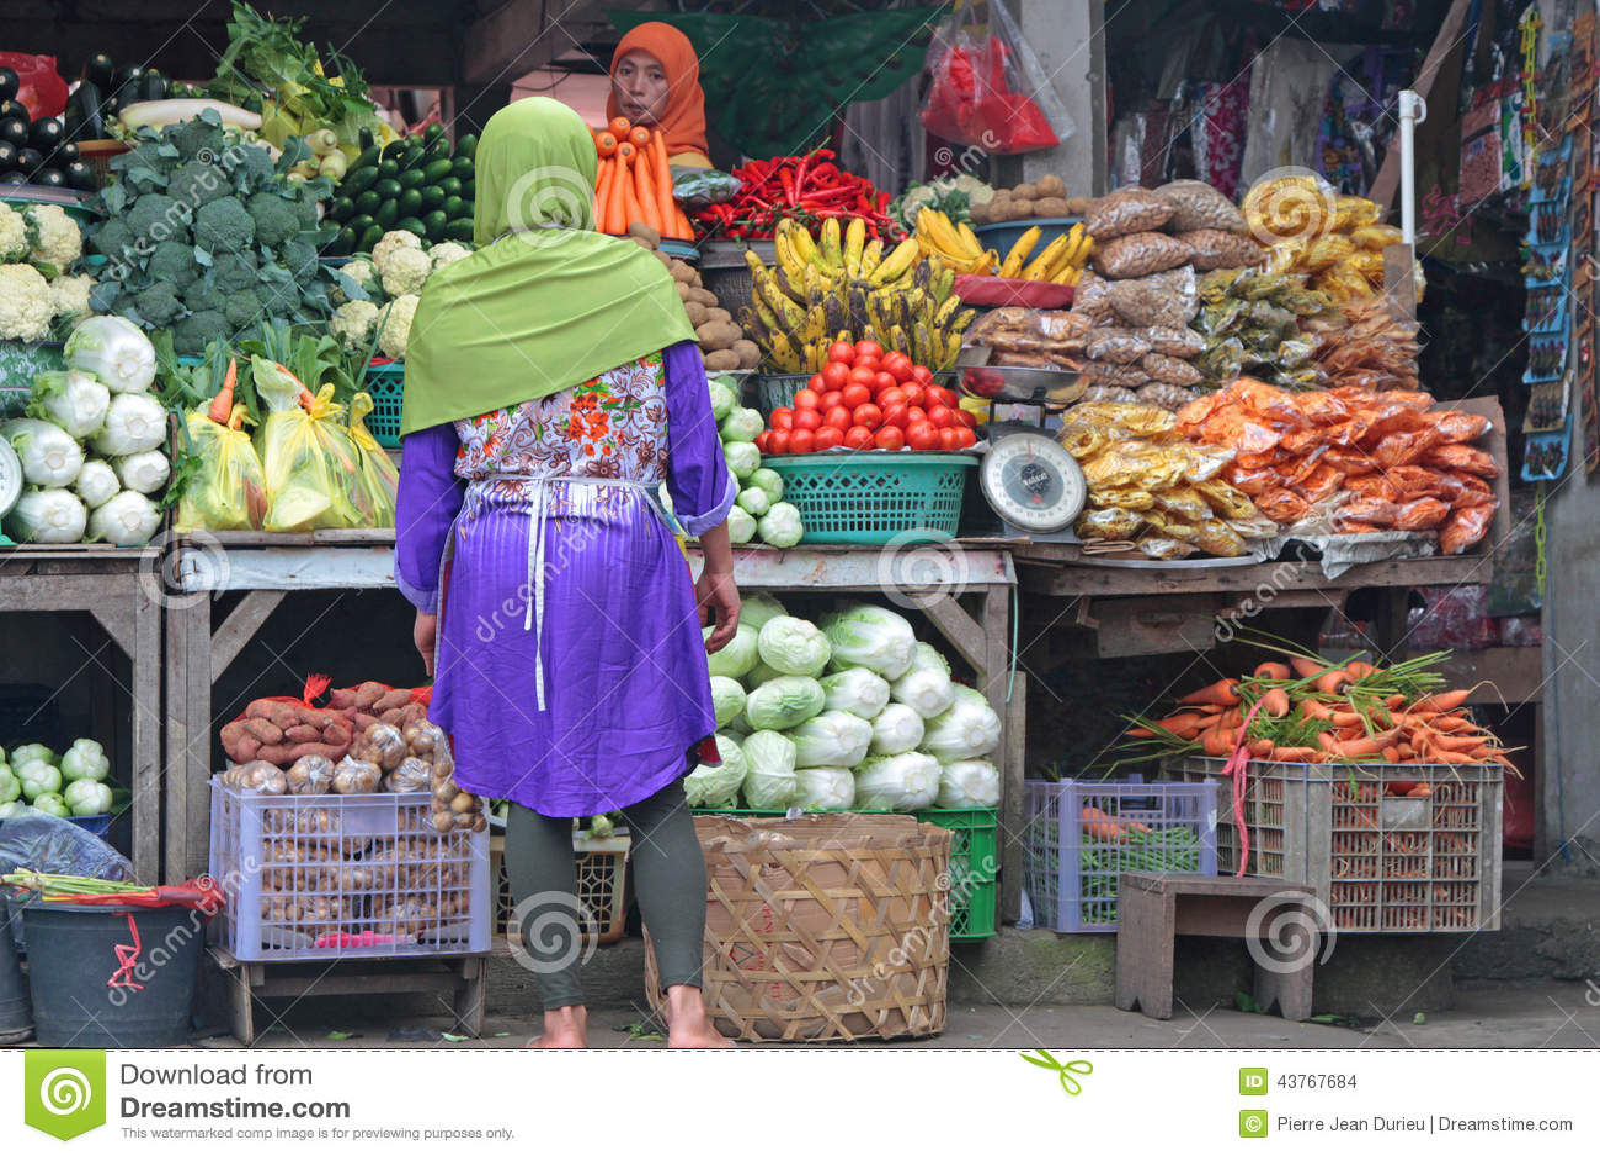 Market In Bedugul Bali Editorial Stock Image Image Of